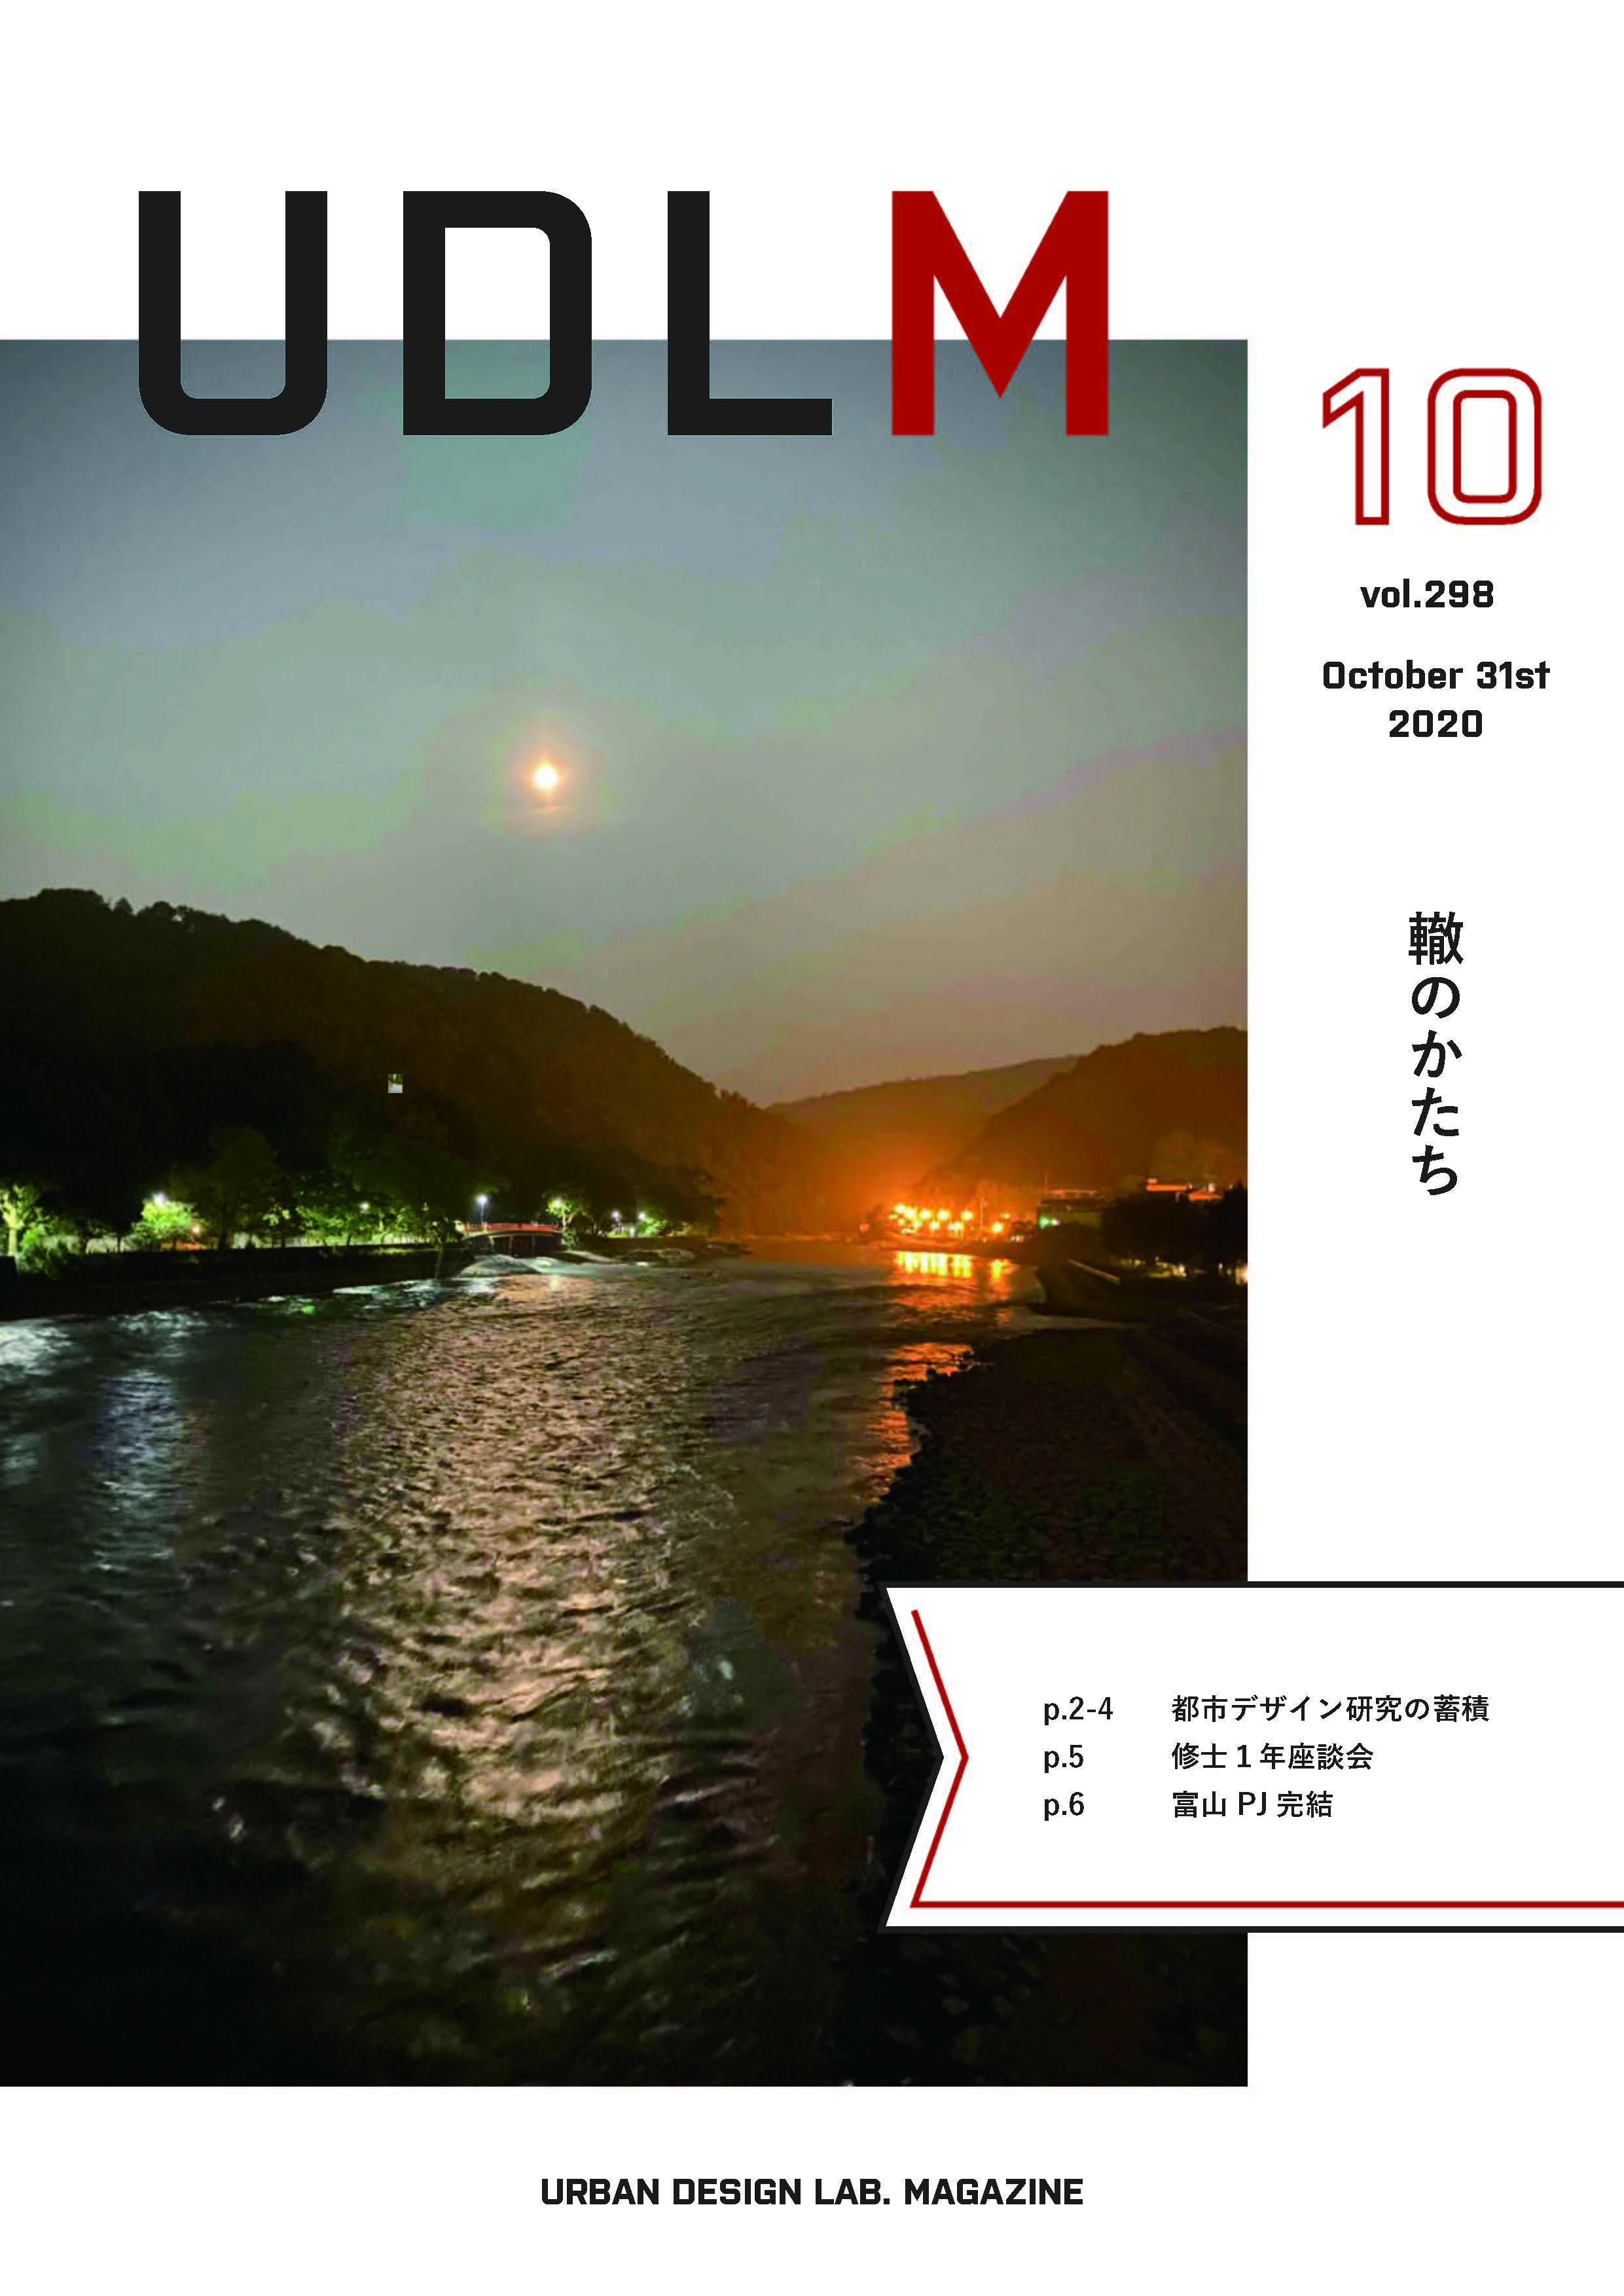 http://ud.t.u-tokyo.ac.jp/blog/_images/vol298.jpg